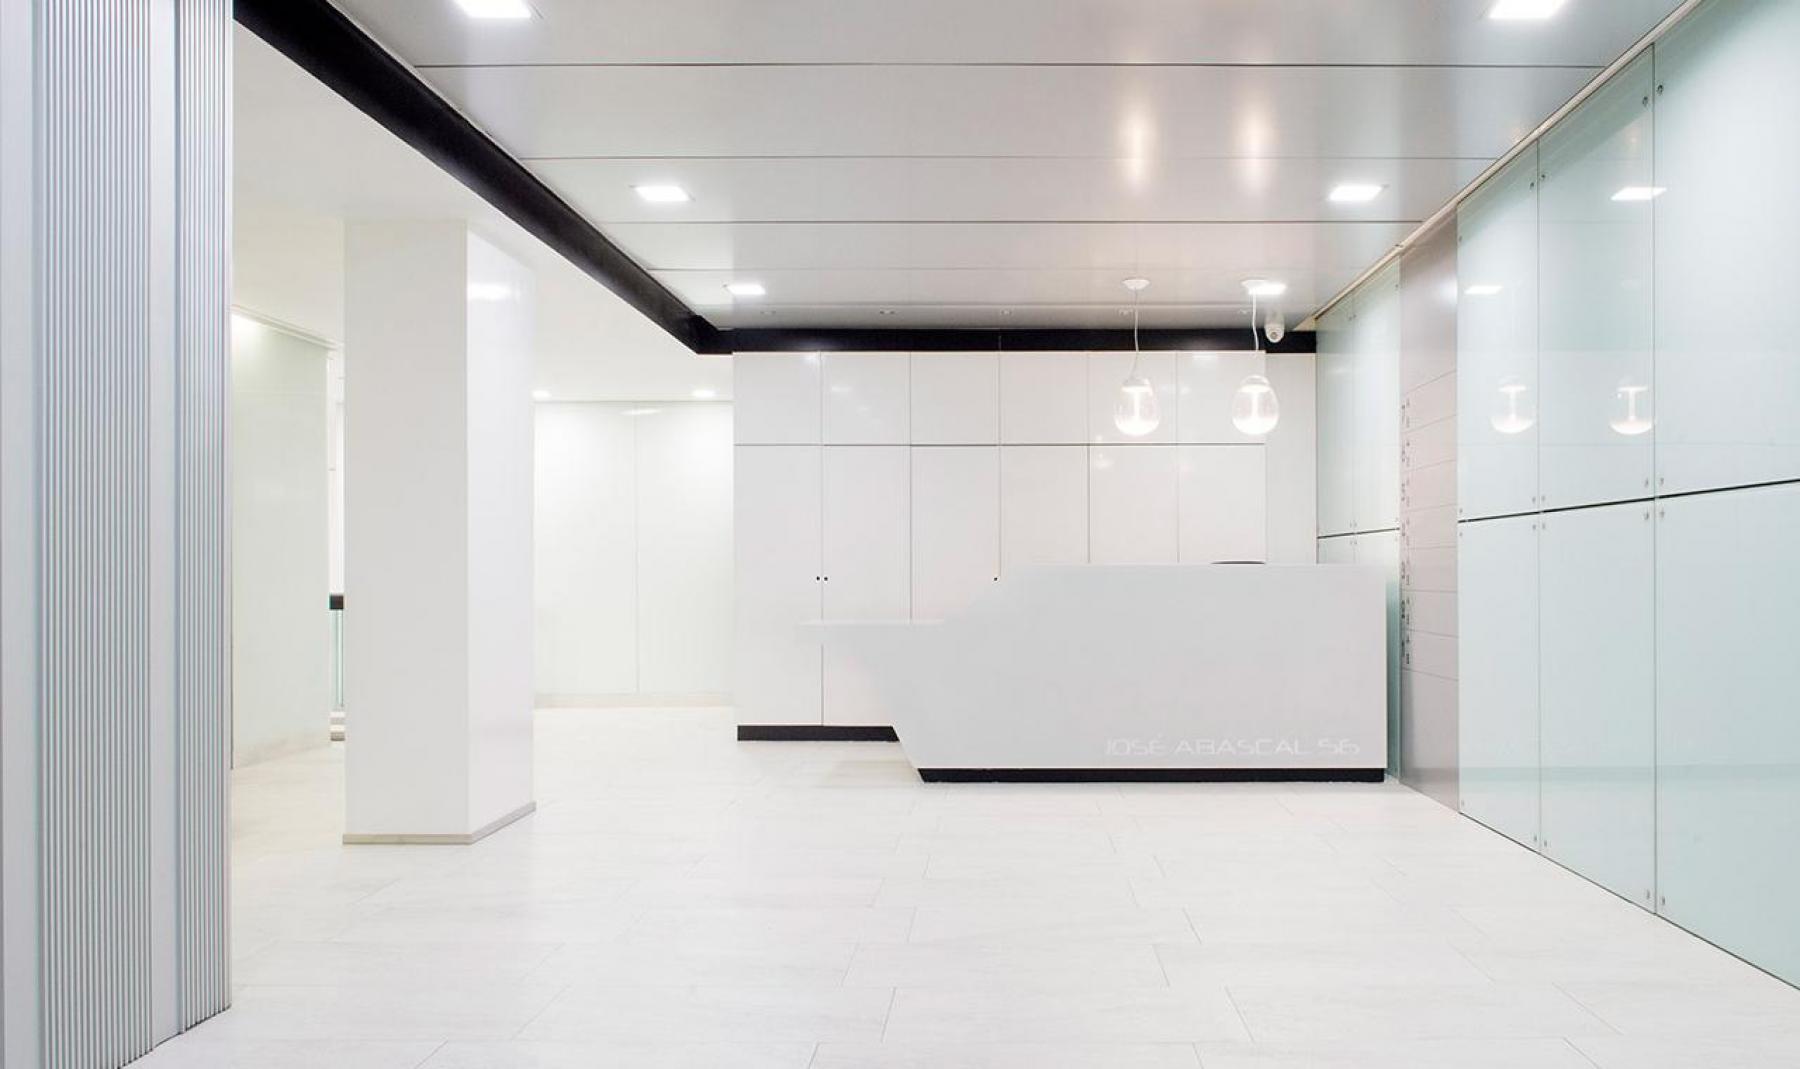 Alquilar oficinas Calle de José Abascal 56, Madrid (2)